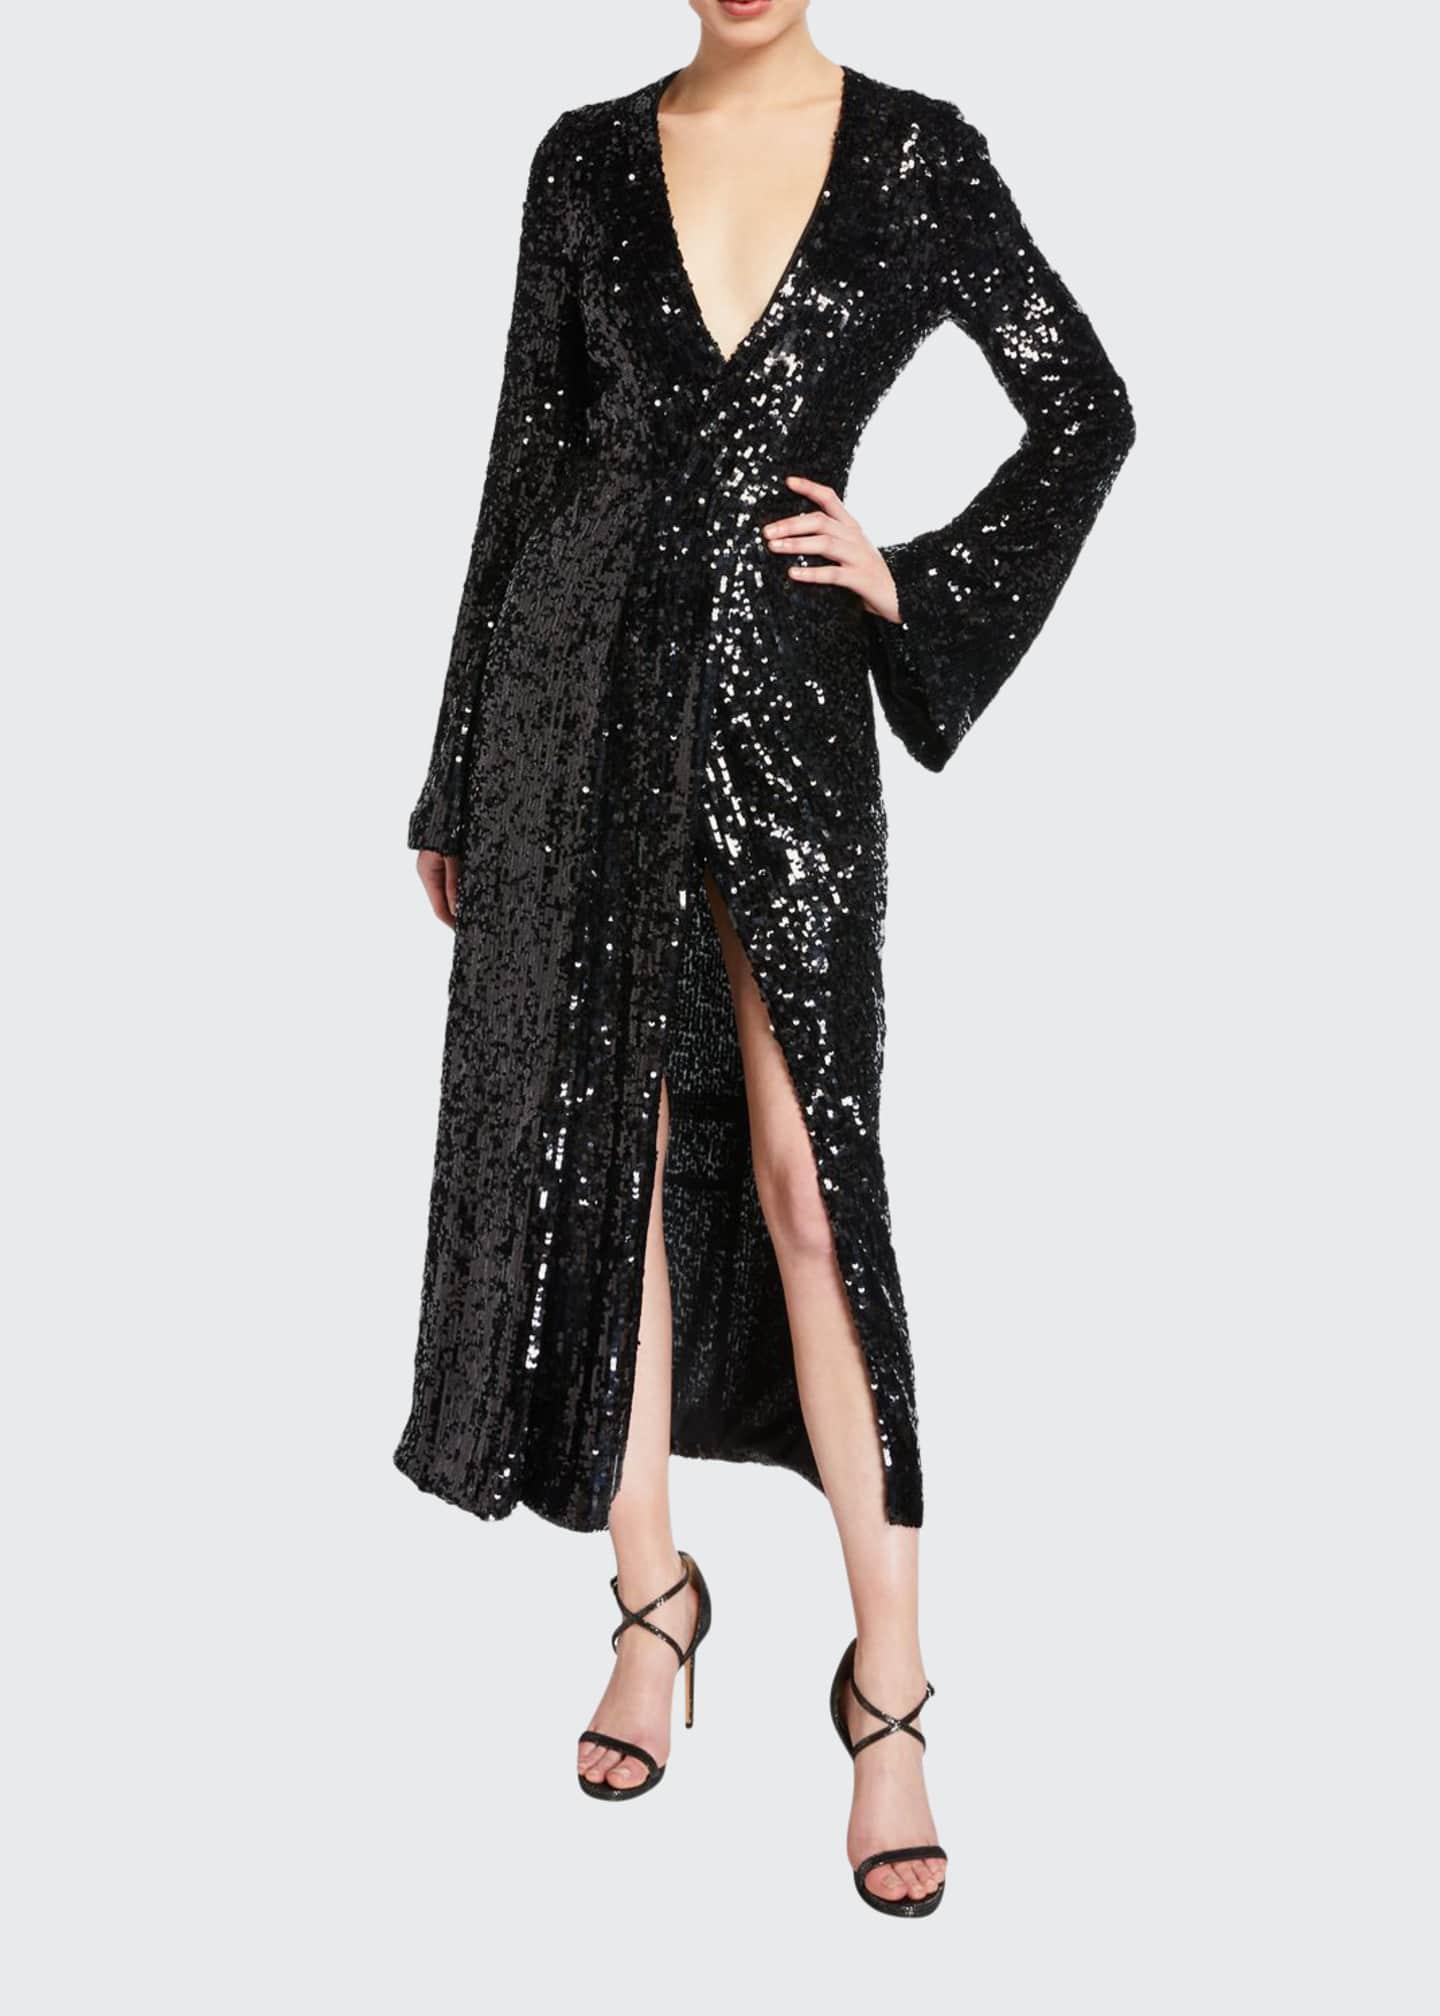 Galvan Sequined Wrapped V-Neck Dress